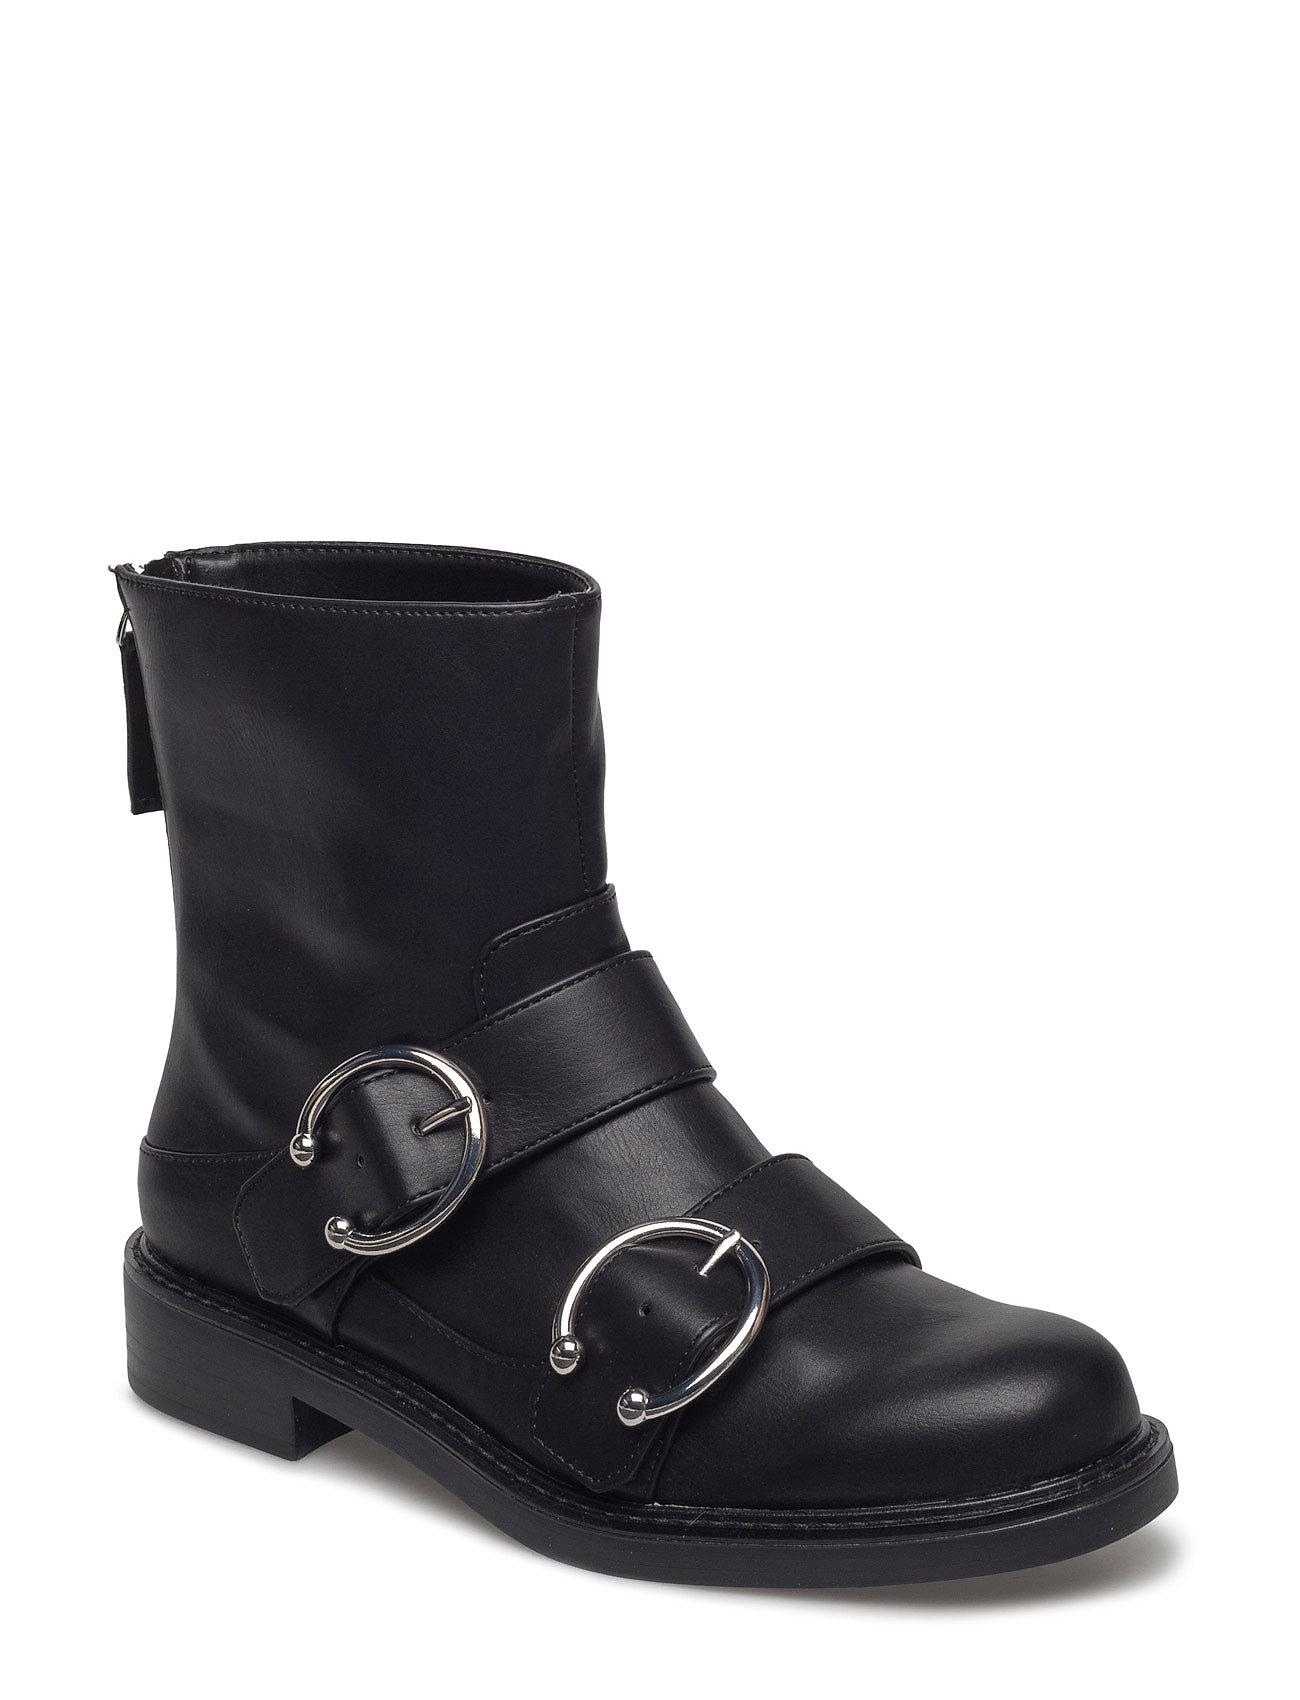 Piercing Detail Ankle Boots Mango Støvler til Damer i Sort